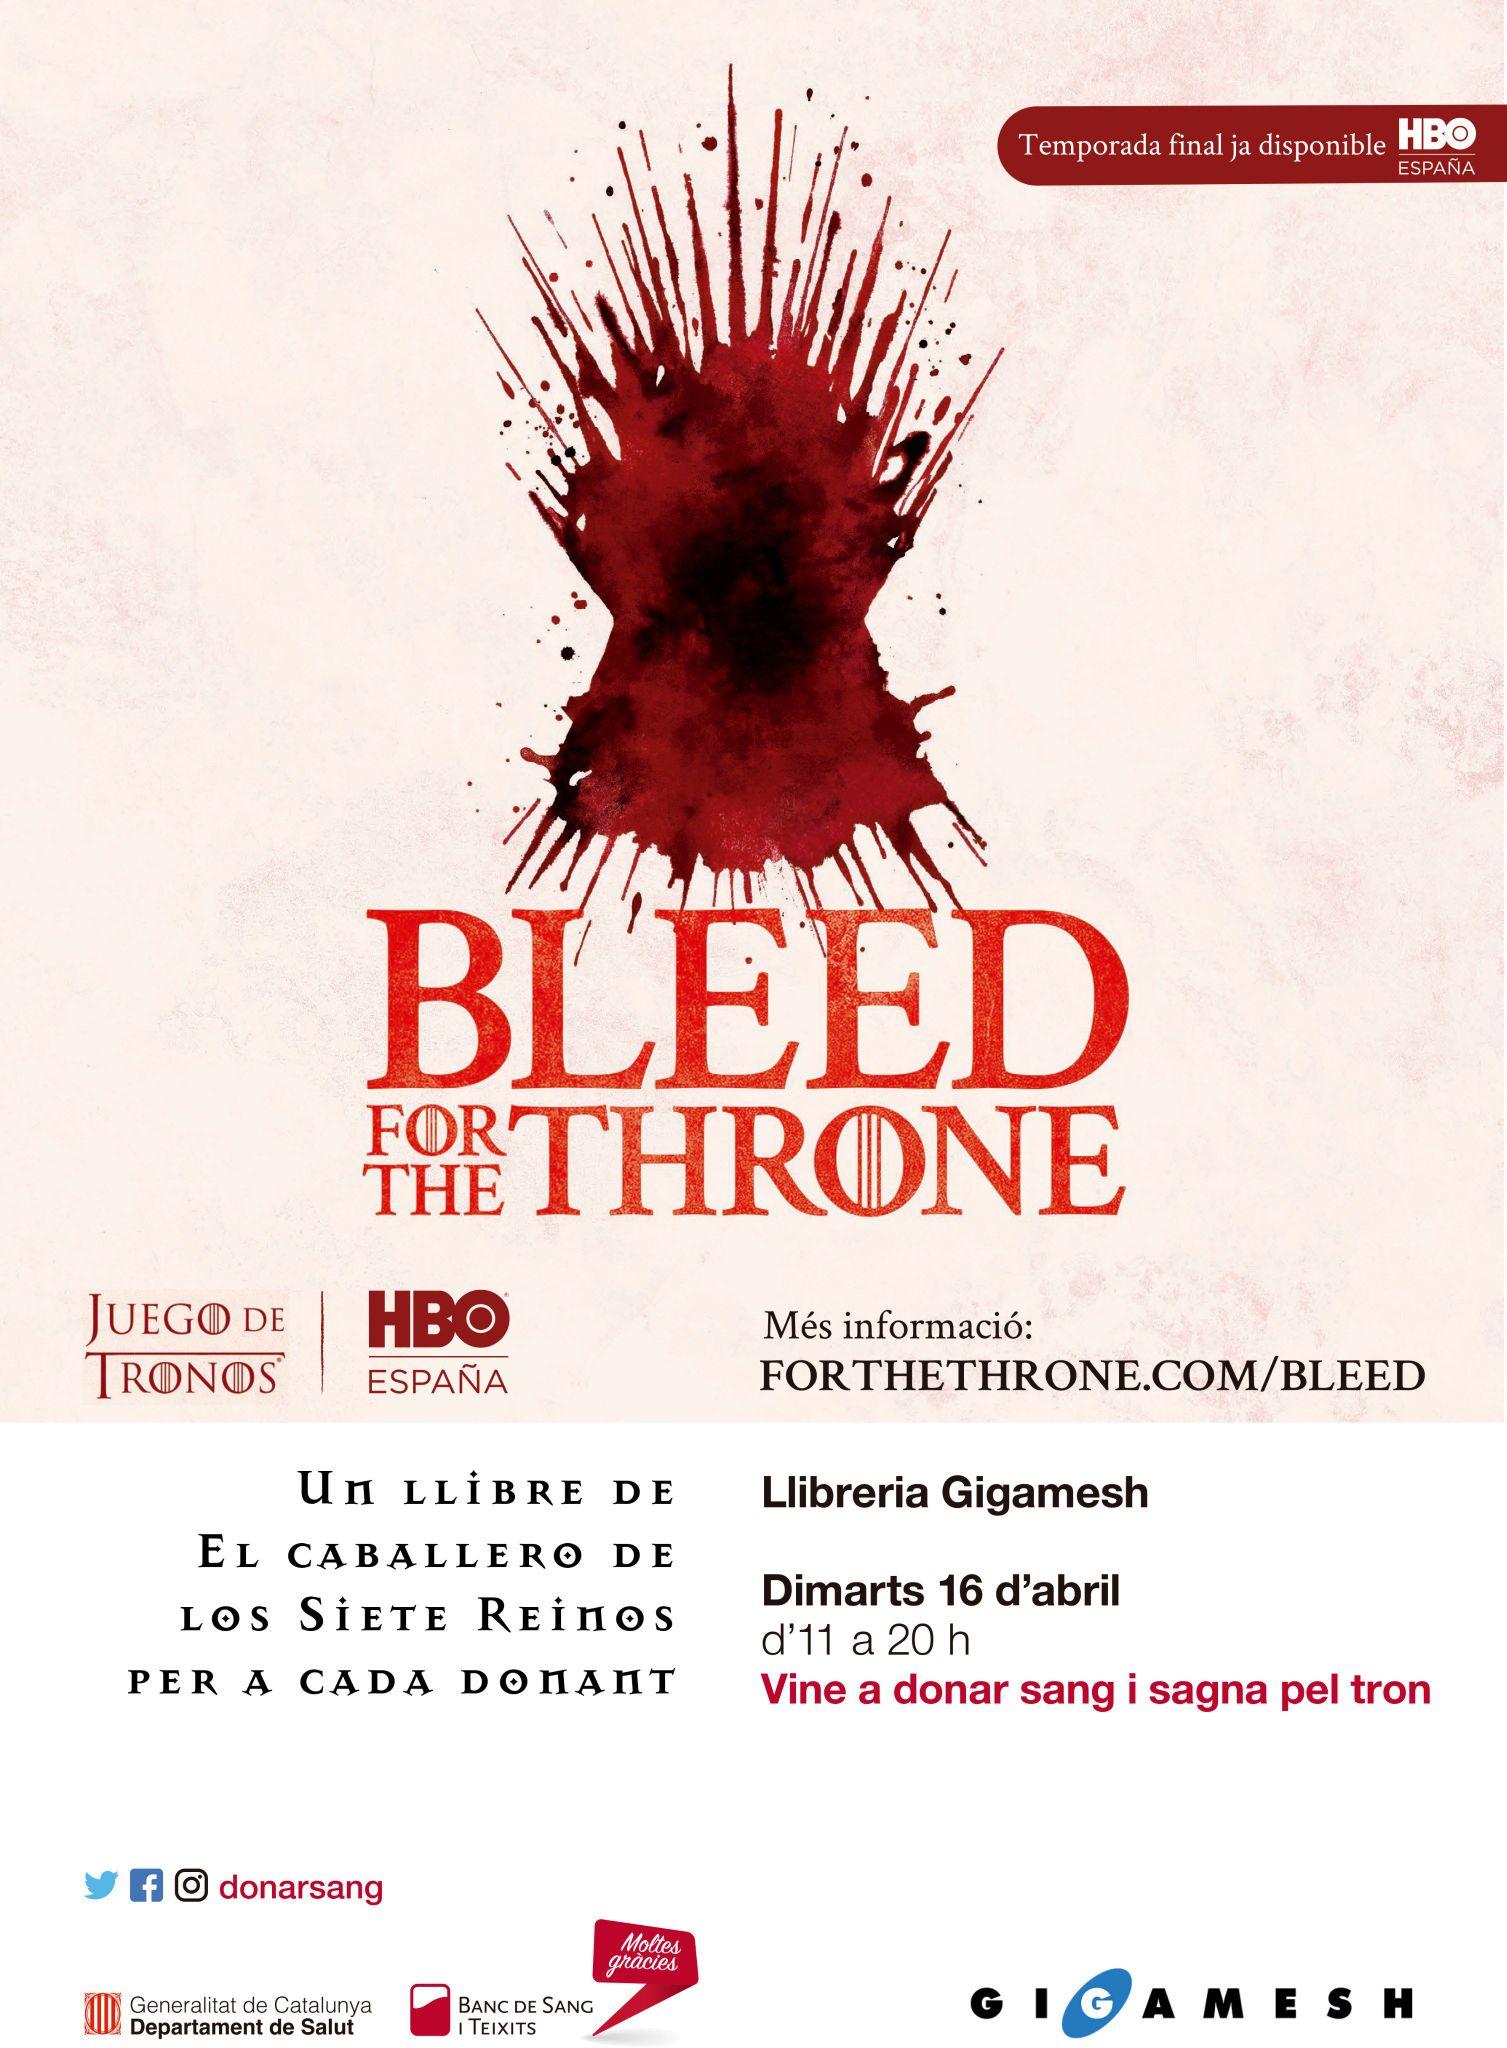 Libro GRATIS Caballero de los siete reinos por donar sangre en Barcelona